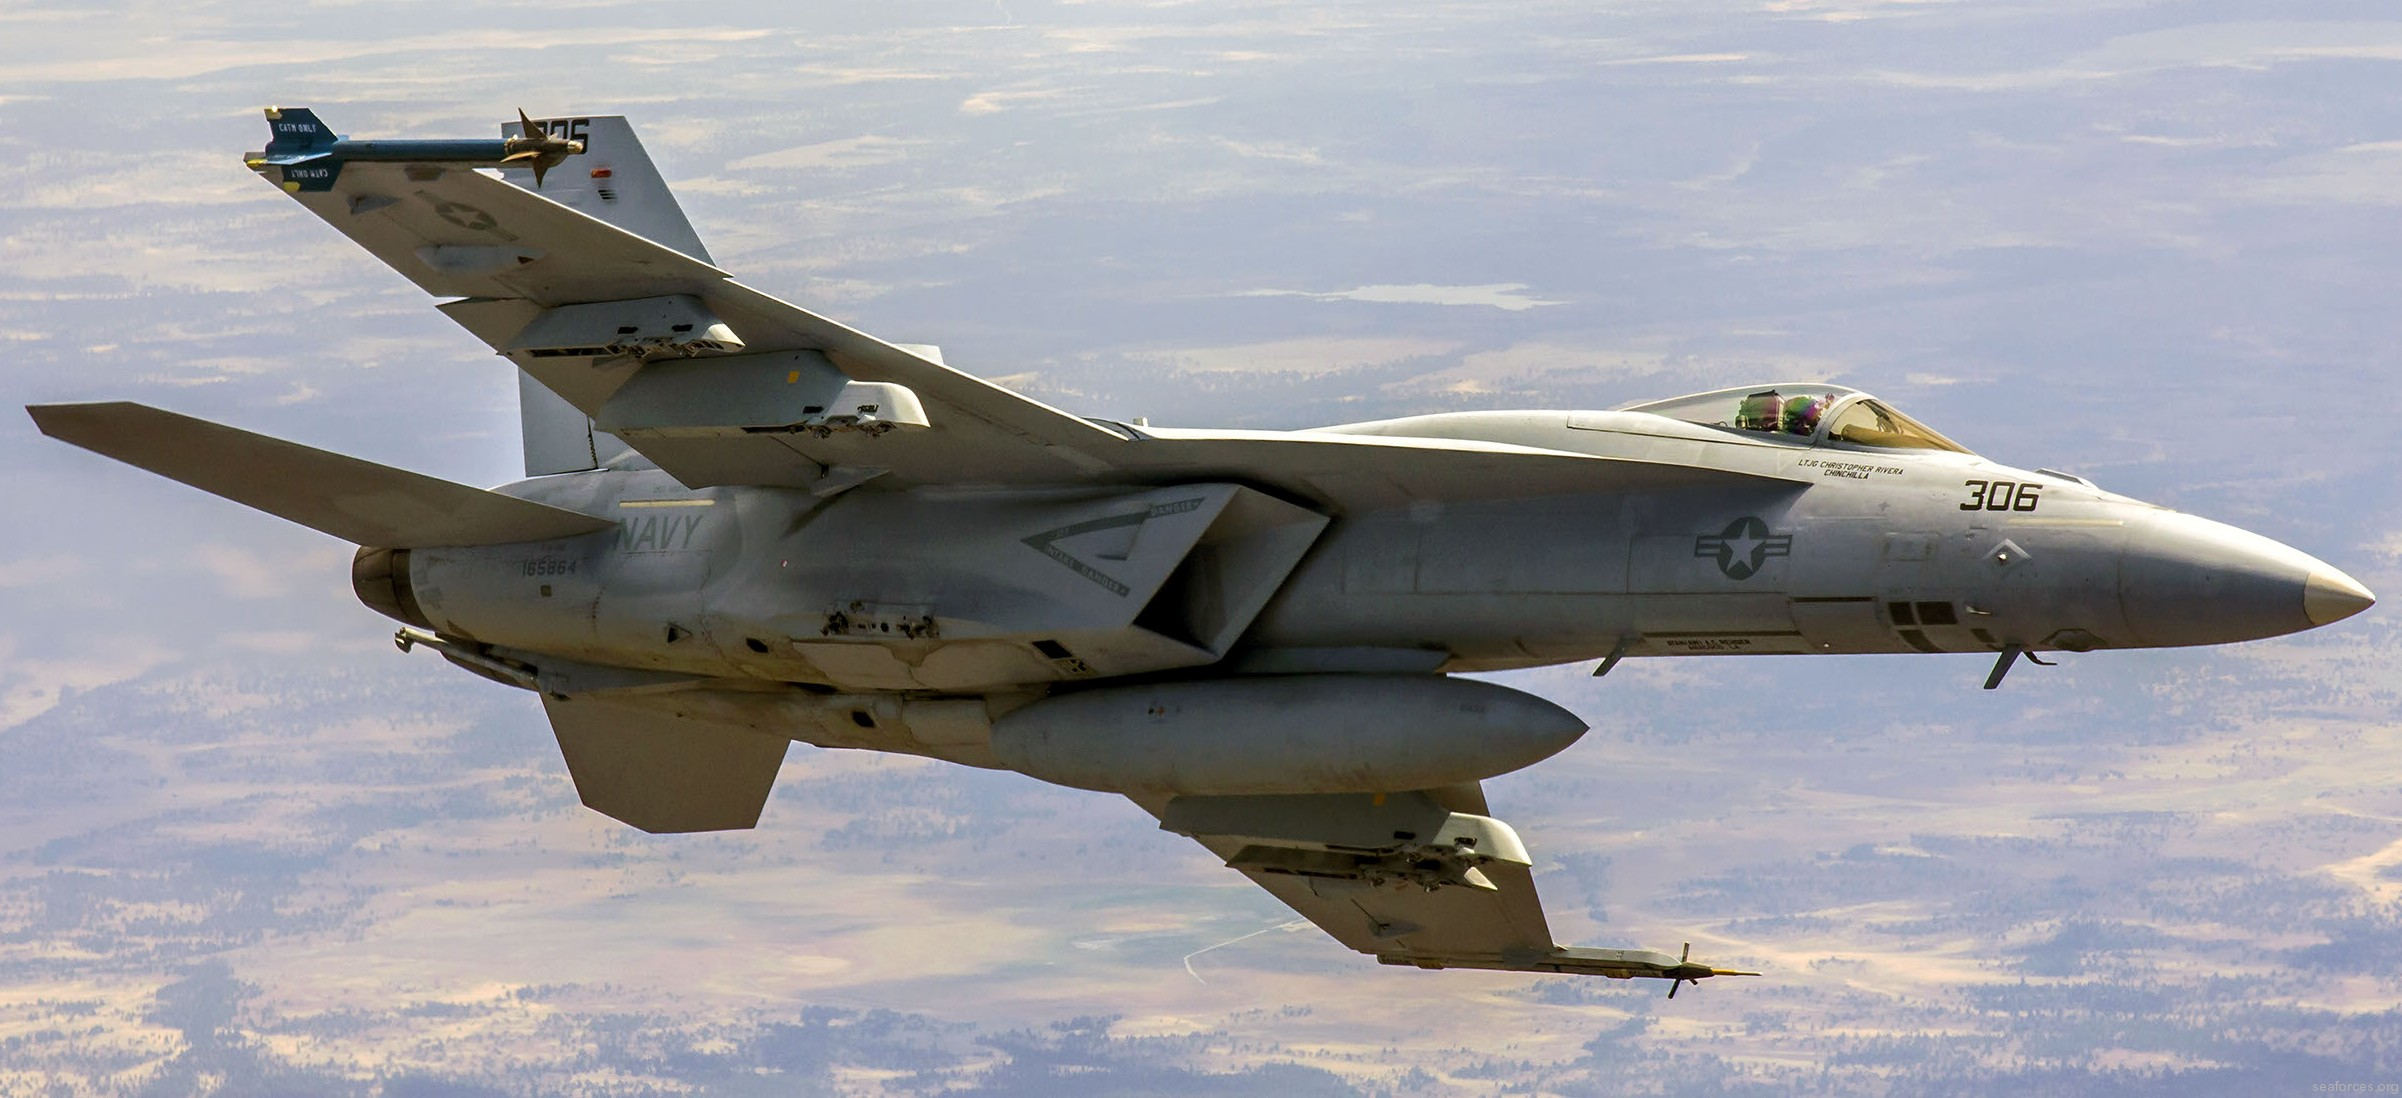 VFA-146 BLUE DIAMONDS Battle E 1997 US NAVY F-18 HORNET Fighter Squadron Patch